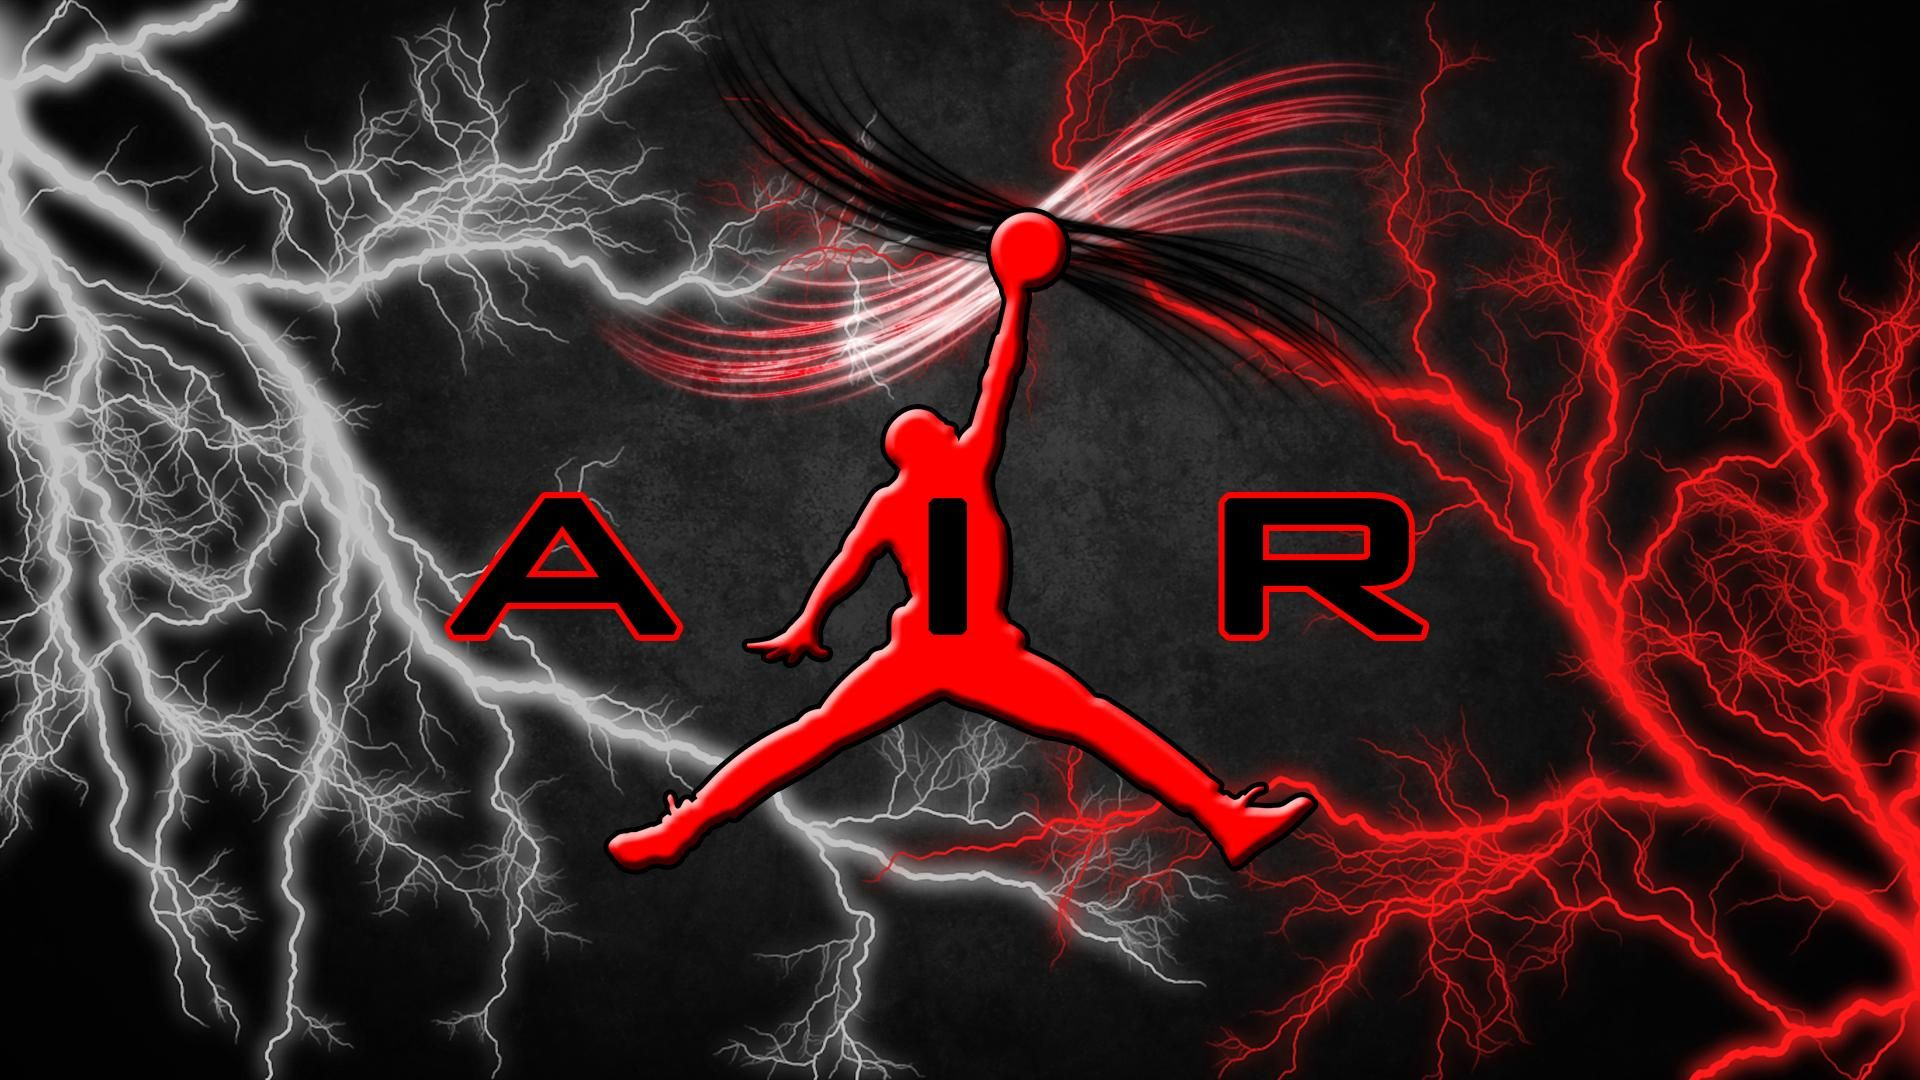 Air Jordan Wallpaper Widescreen Jordan Logo Wallpaper Michael Jordan Images Logo Wallpaper Hd